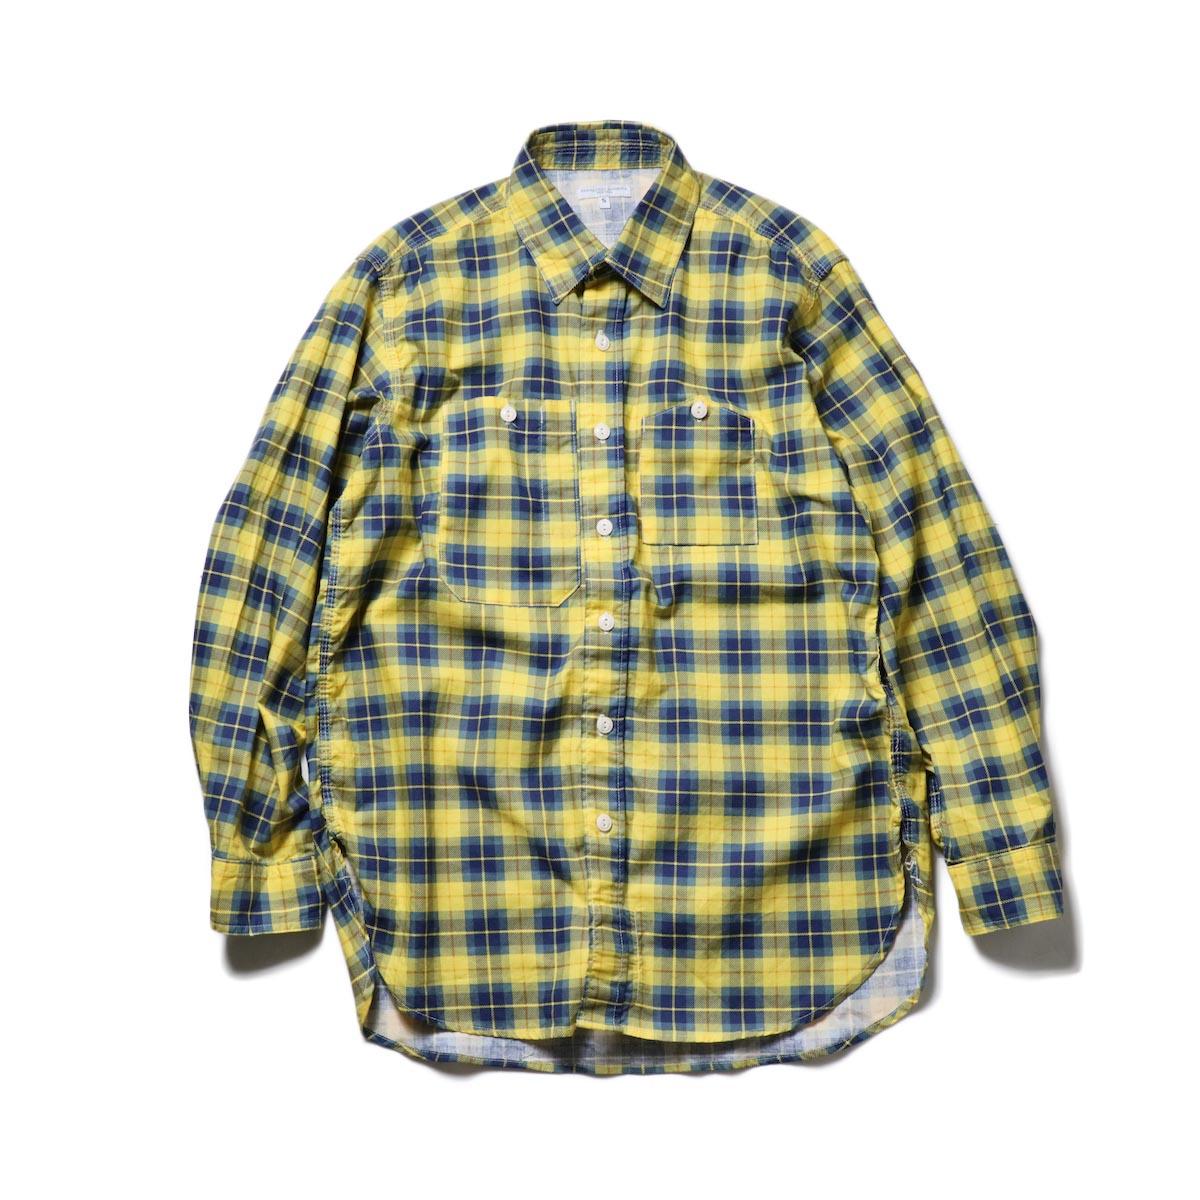 Engineered Garments / Work Shirt -Cotton Printed Plaid (Yellow)